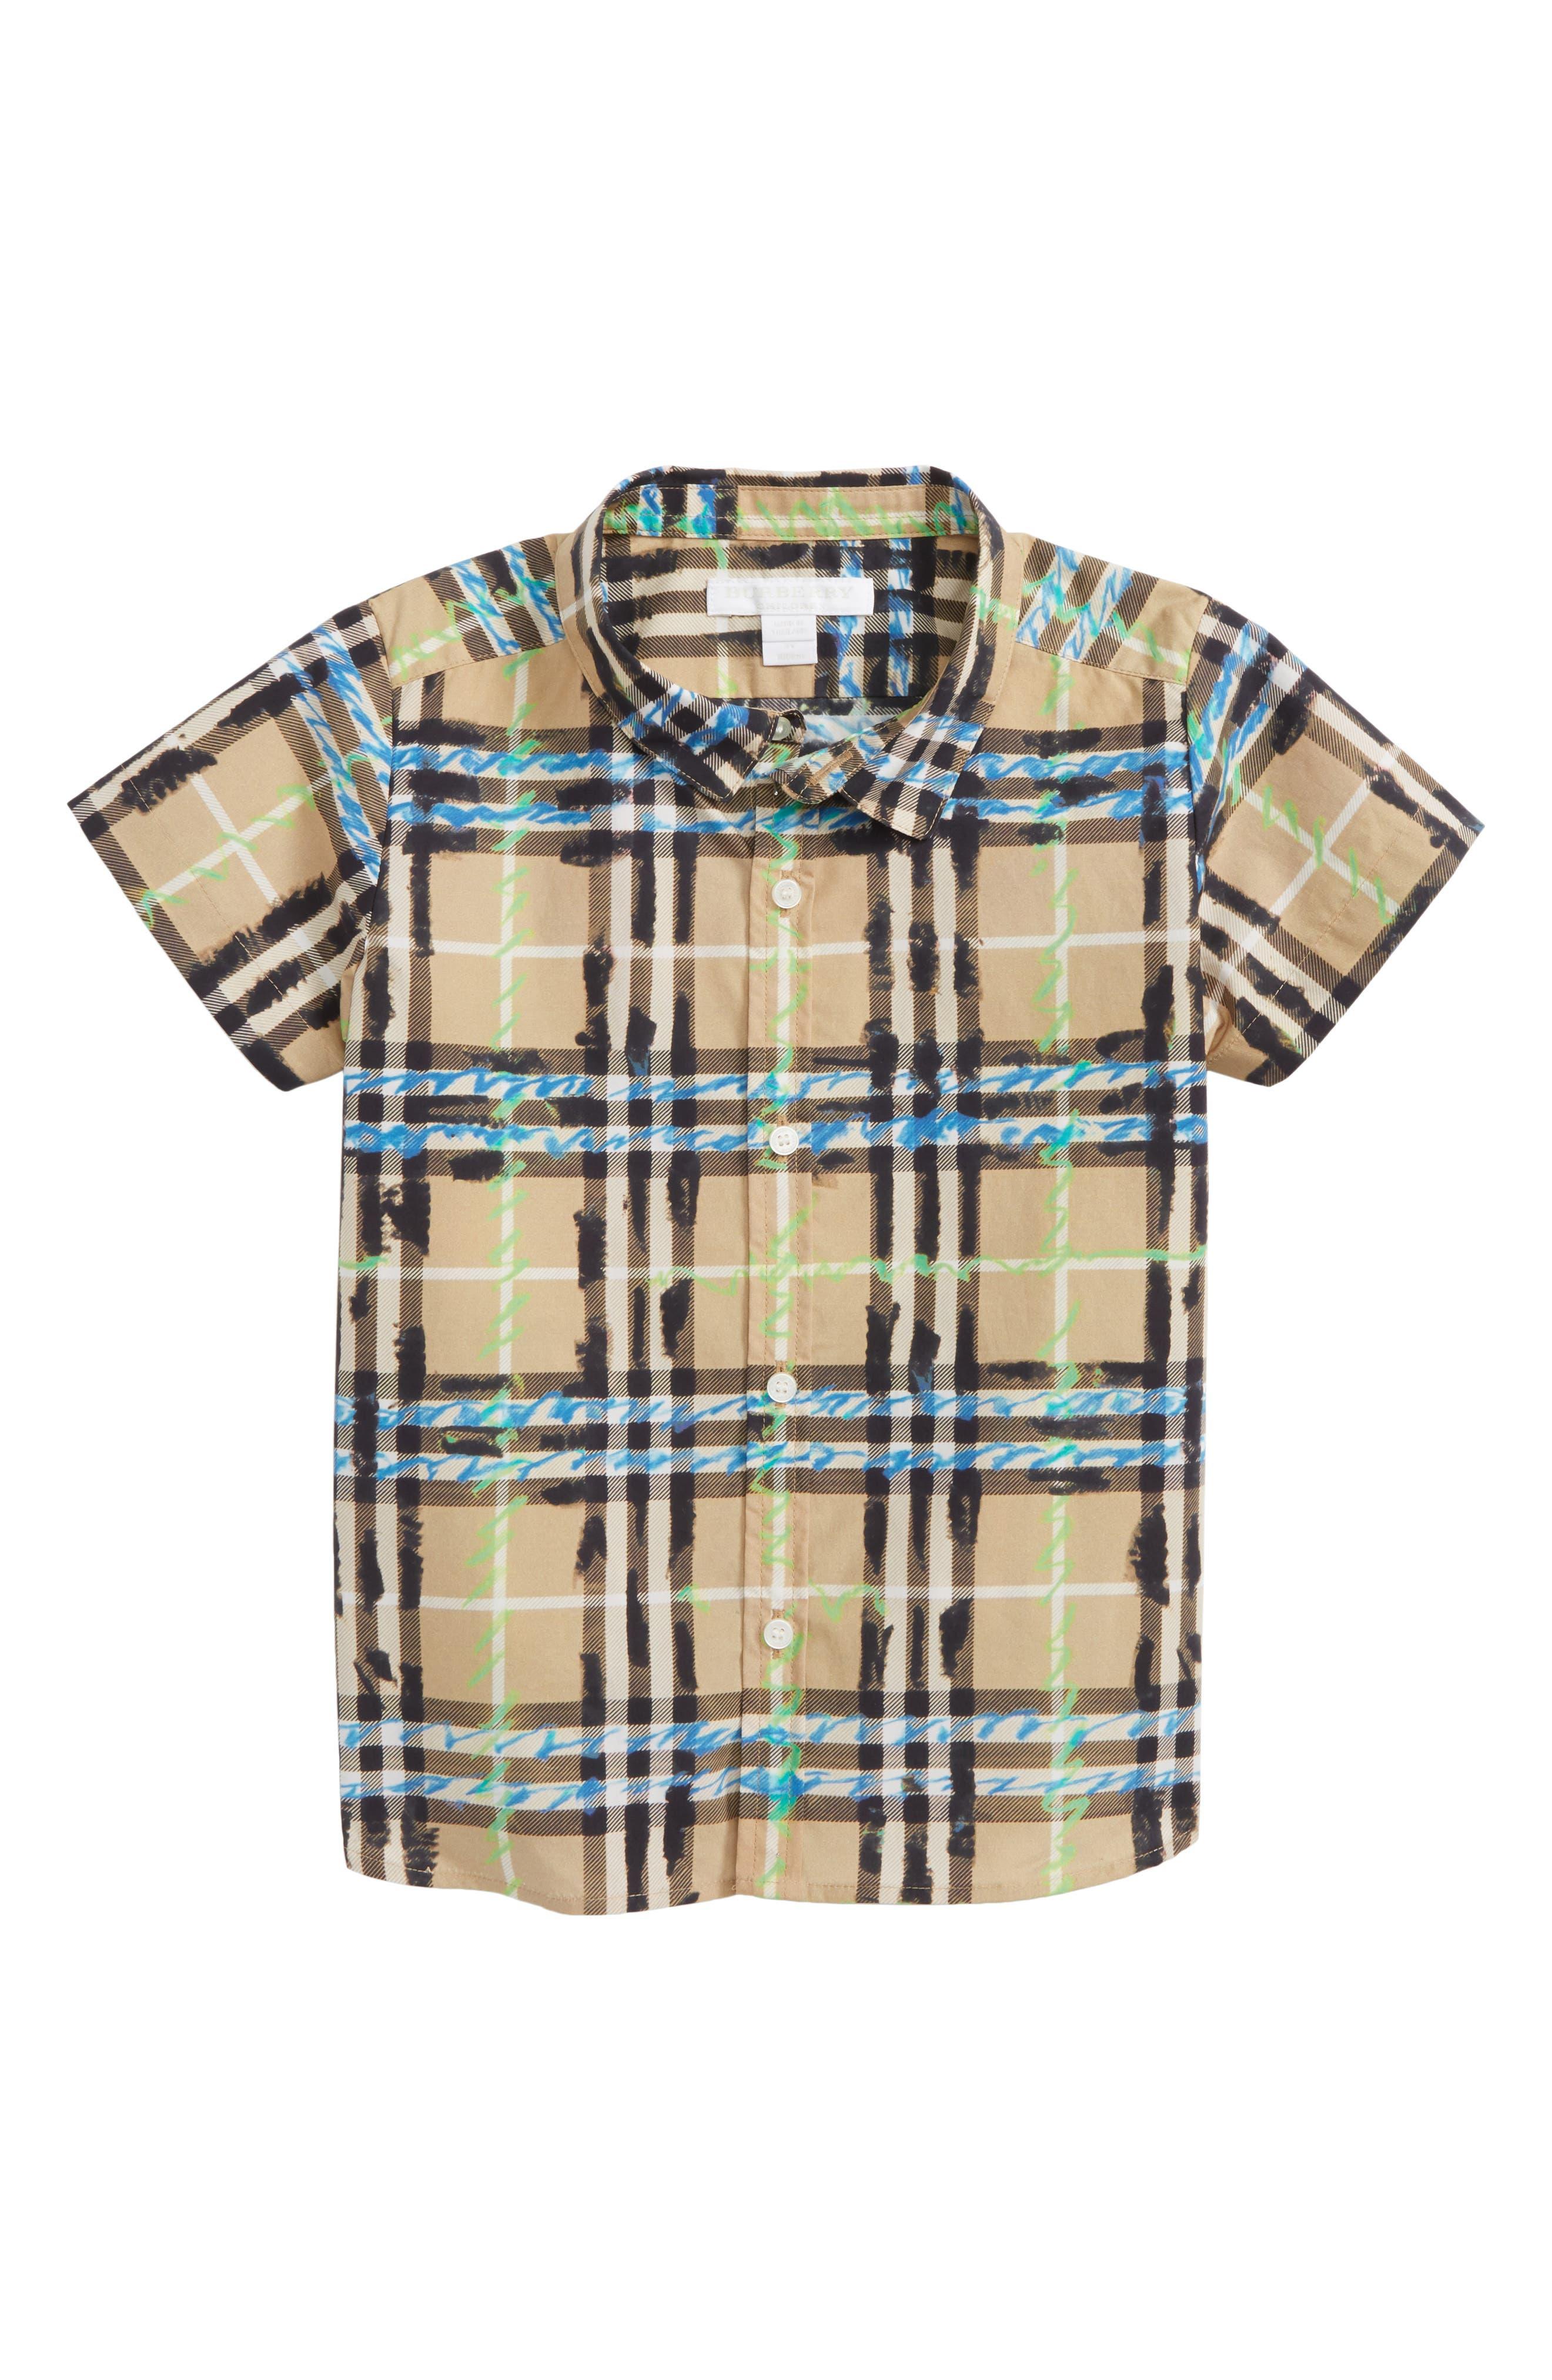 Main Image - Burberry Clarkey Scribble Plaid Woven Shirt (Toddler Boys)